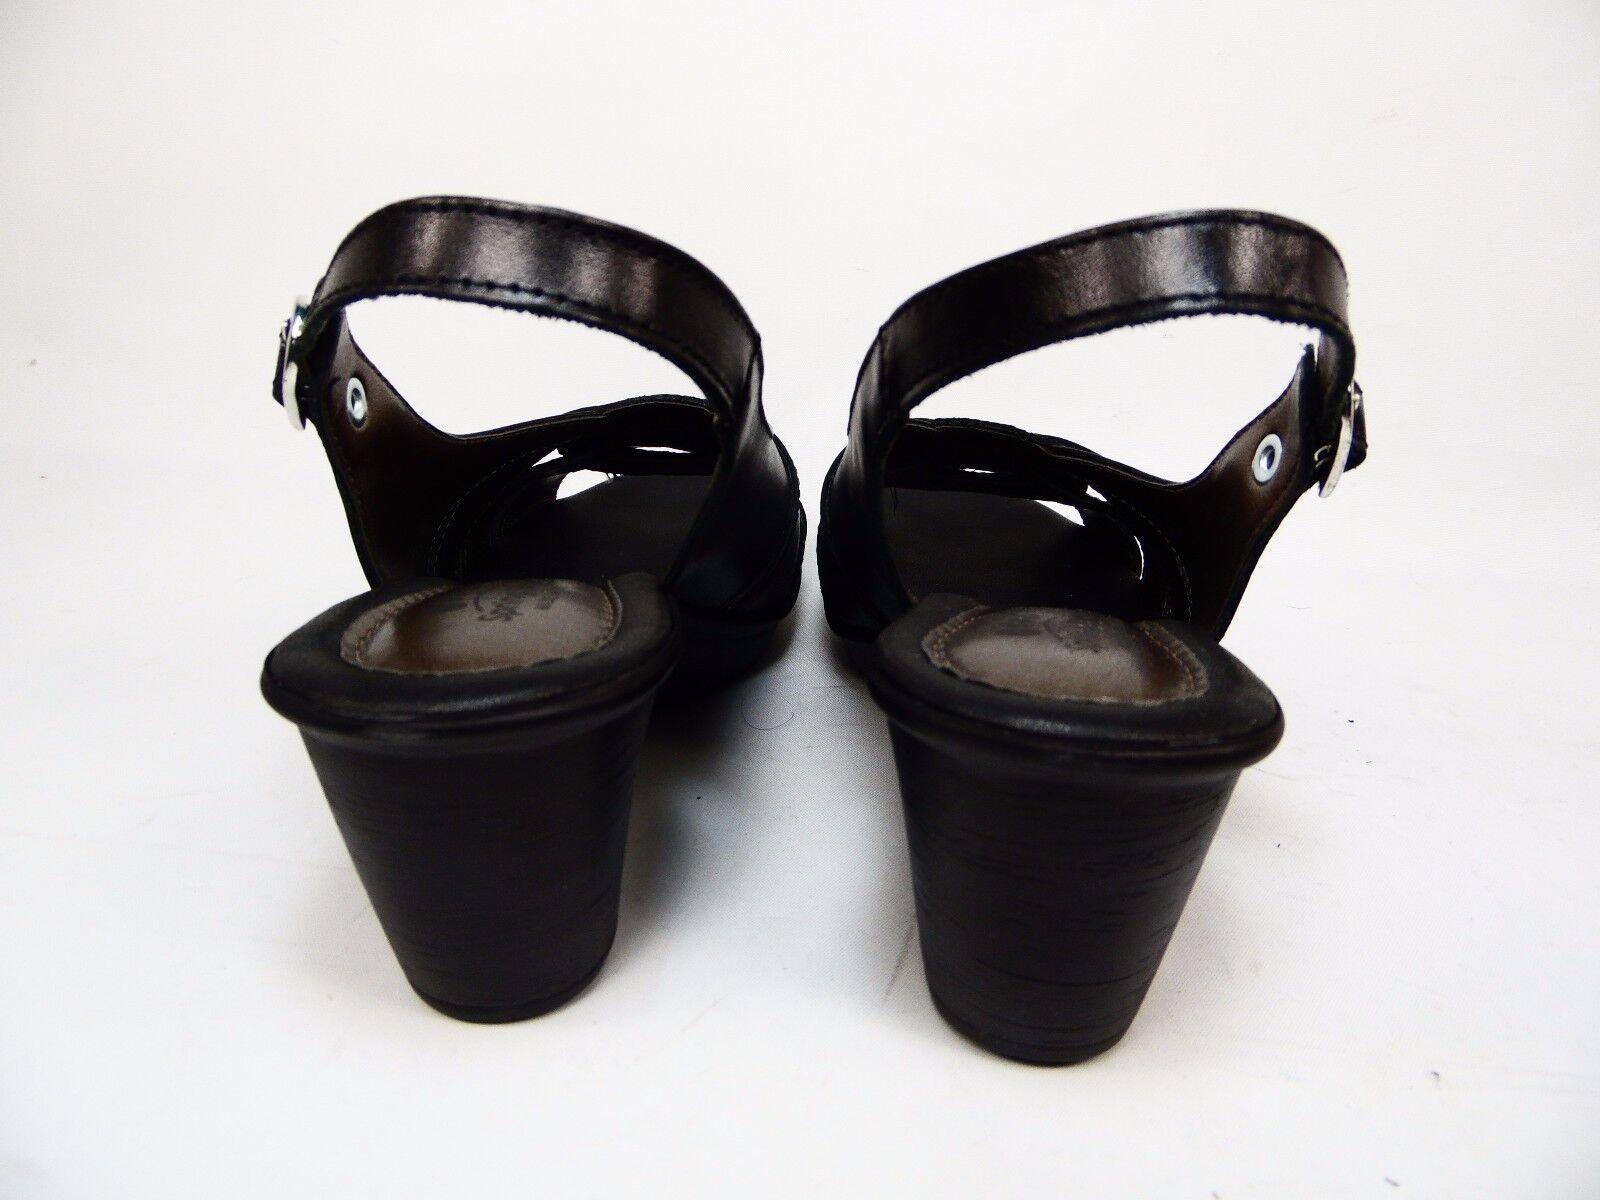 Spring Step Adorable Slingback Sandals nero Dimensione 37 (US (US (US 6.5-7) 59ecf0